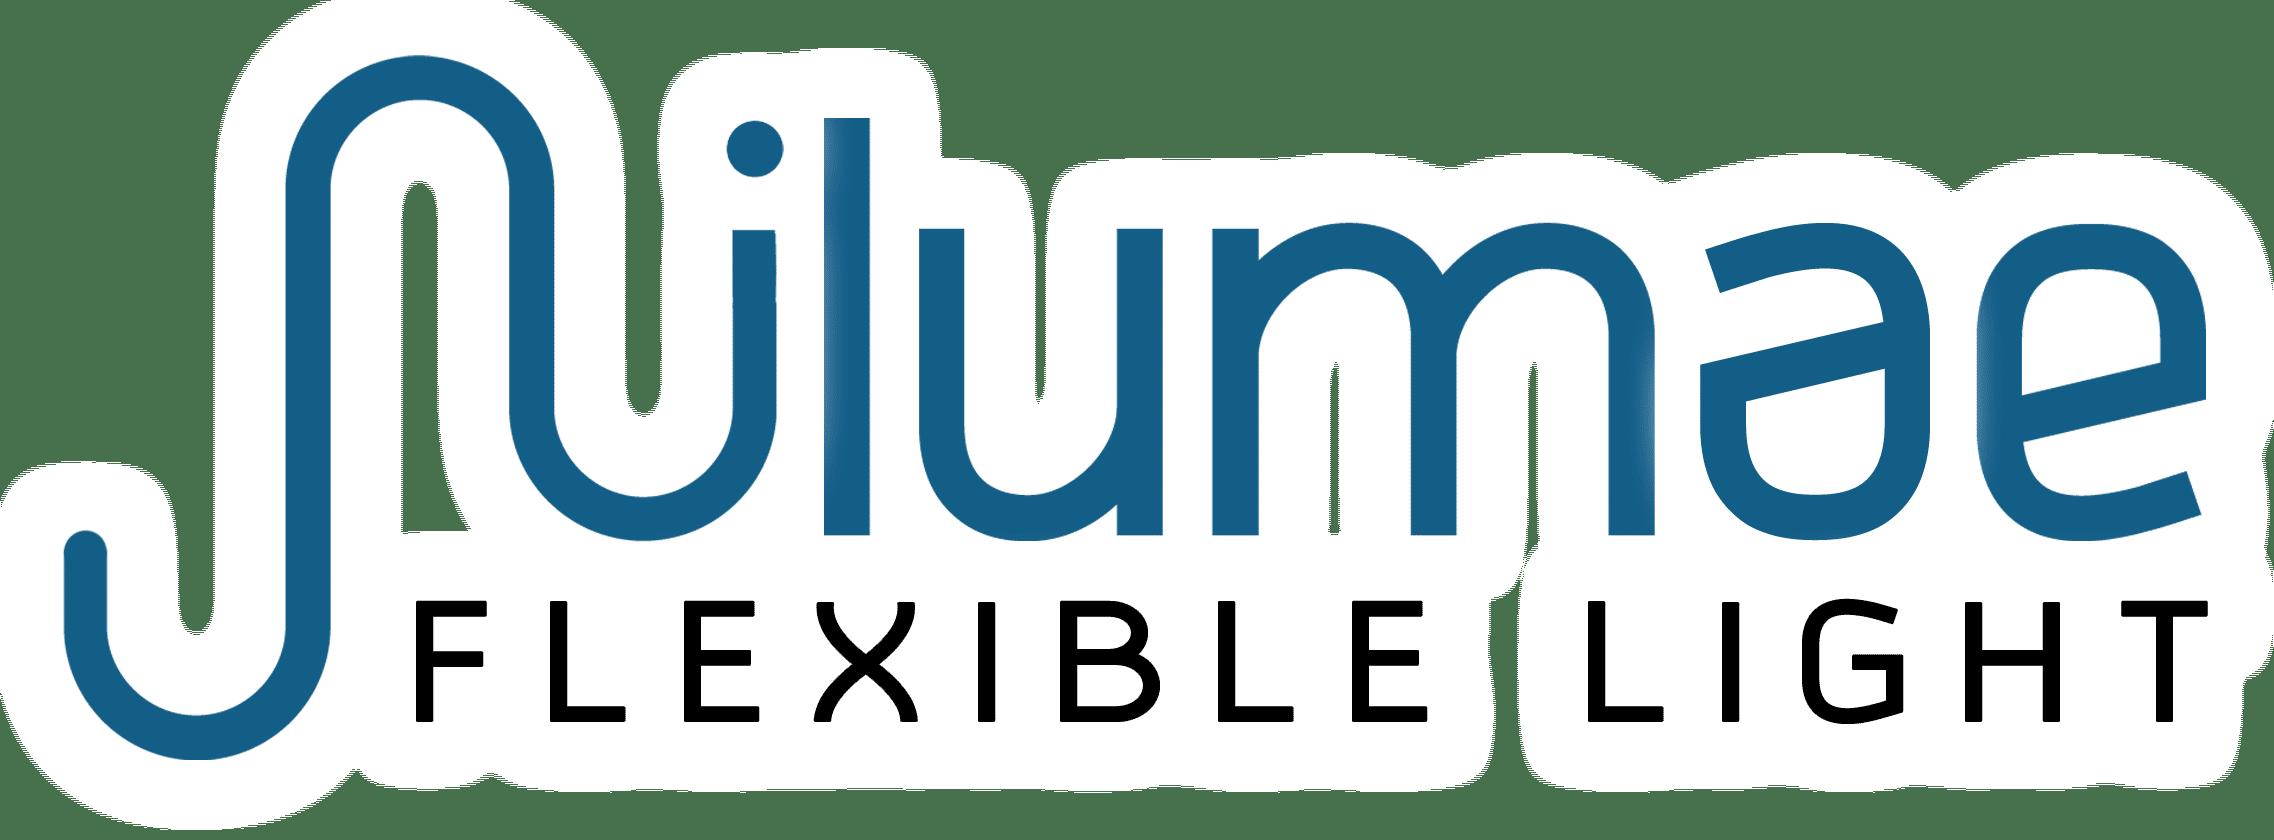 Ilumae Logo